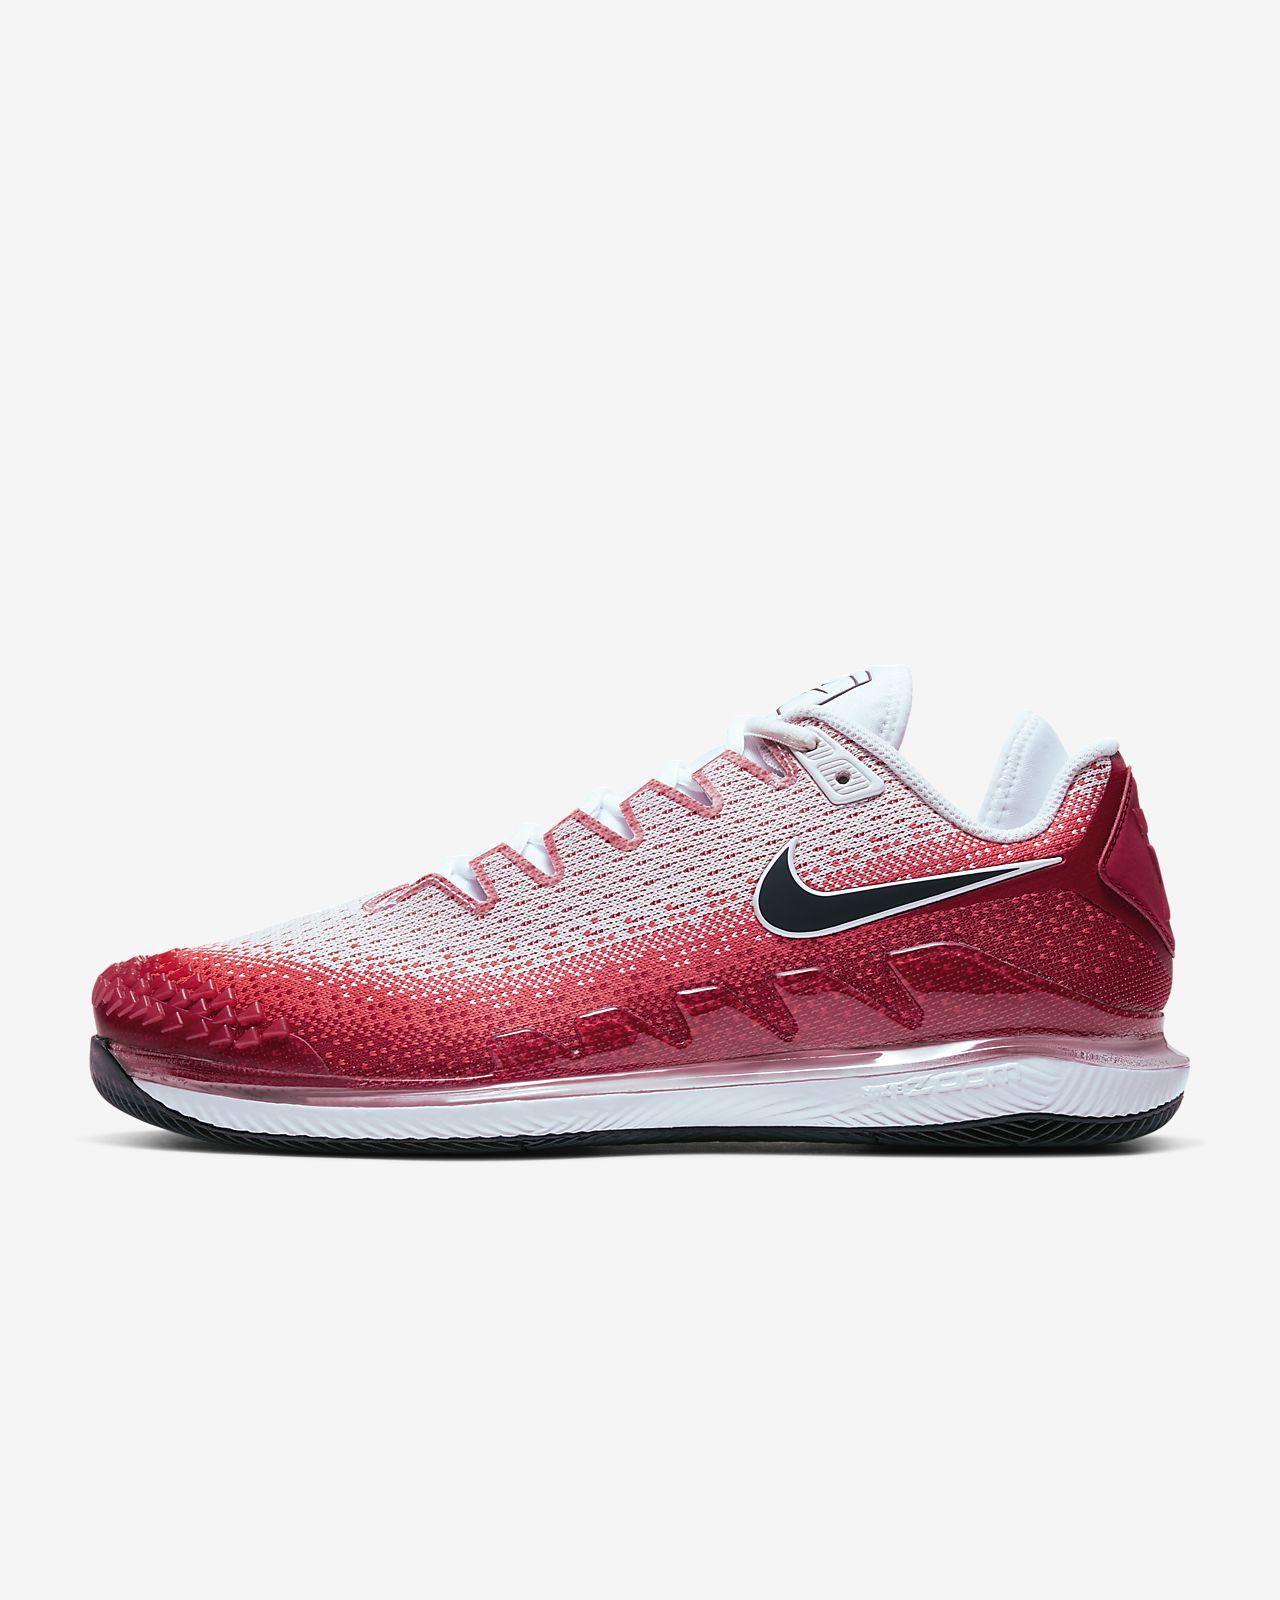 Scarpa da tennis per campi in cemento NikeCourt Air Zoom Vapor X Knit Uomo